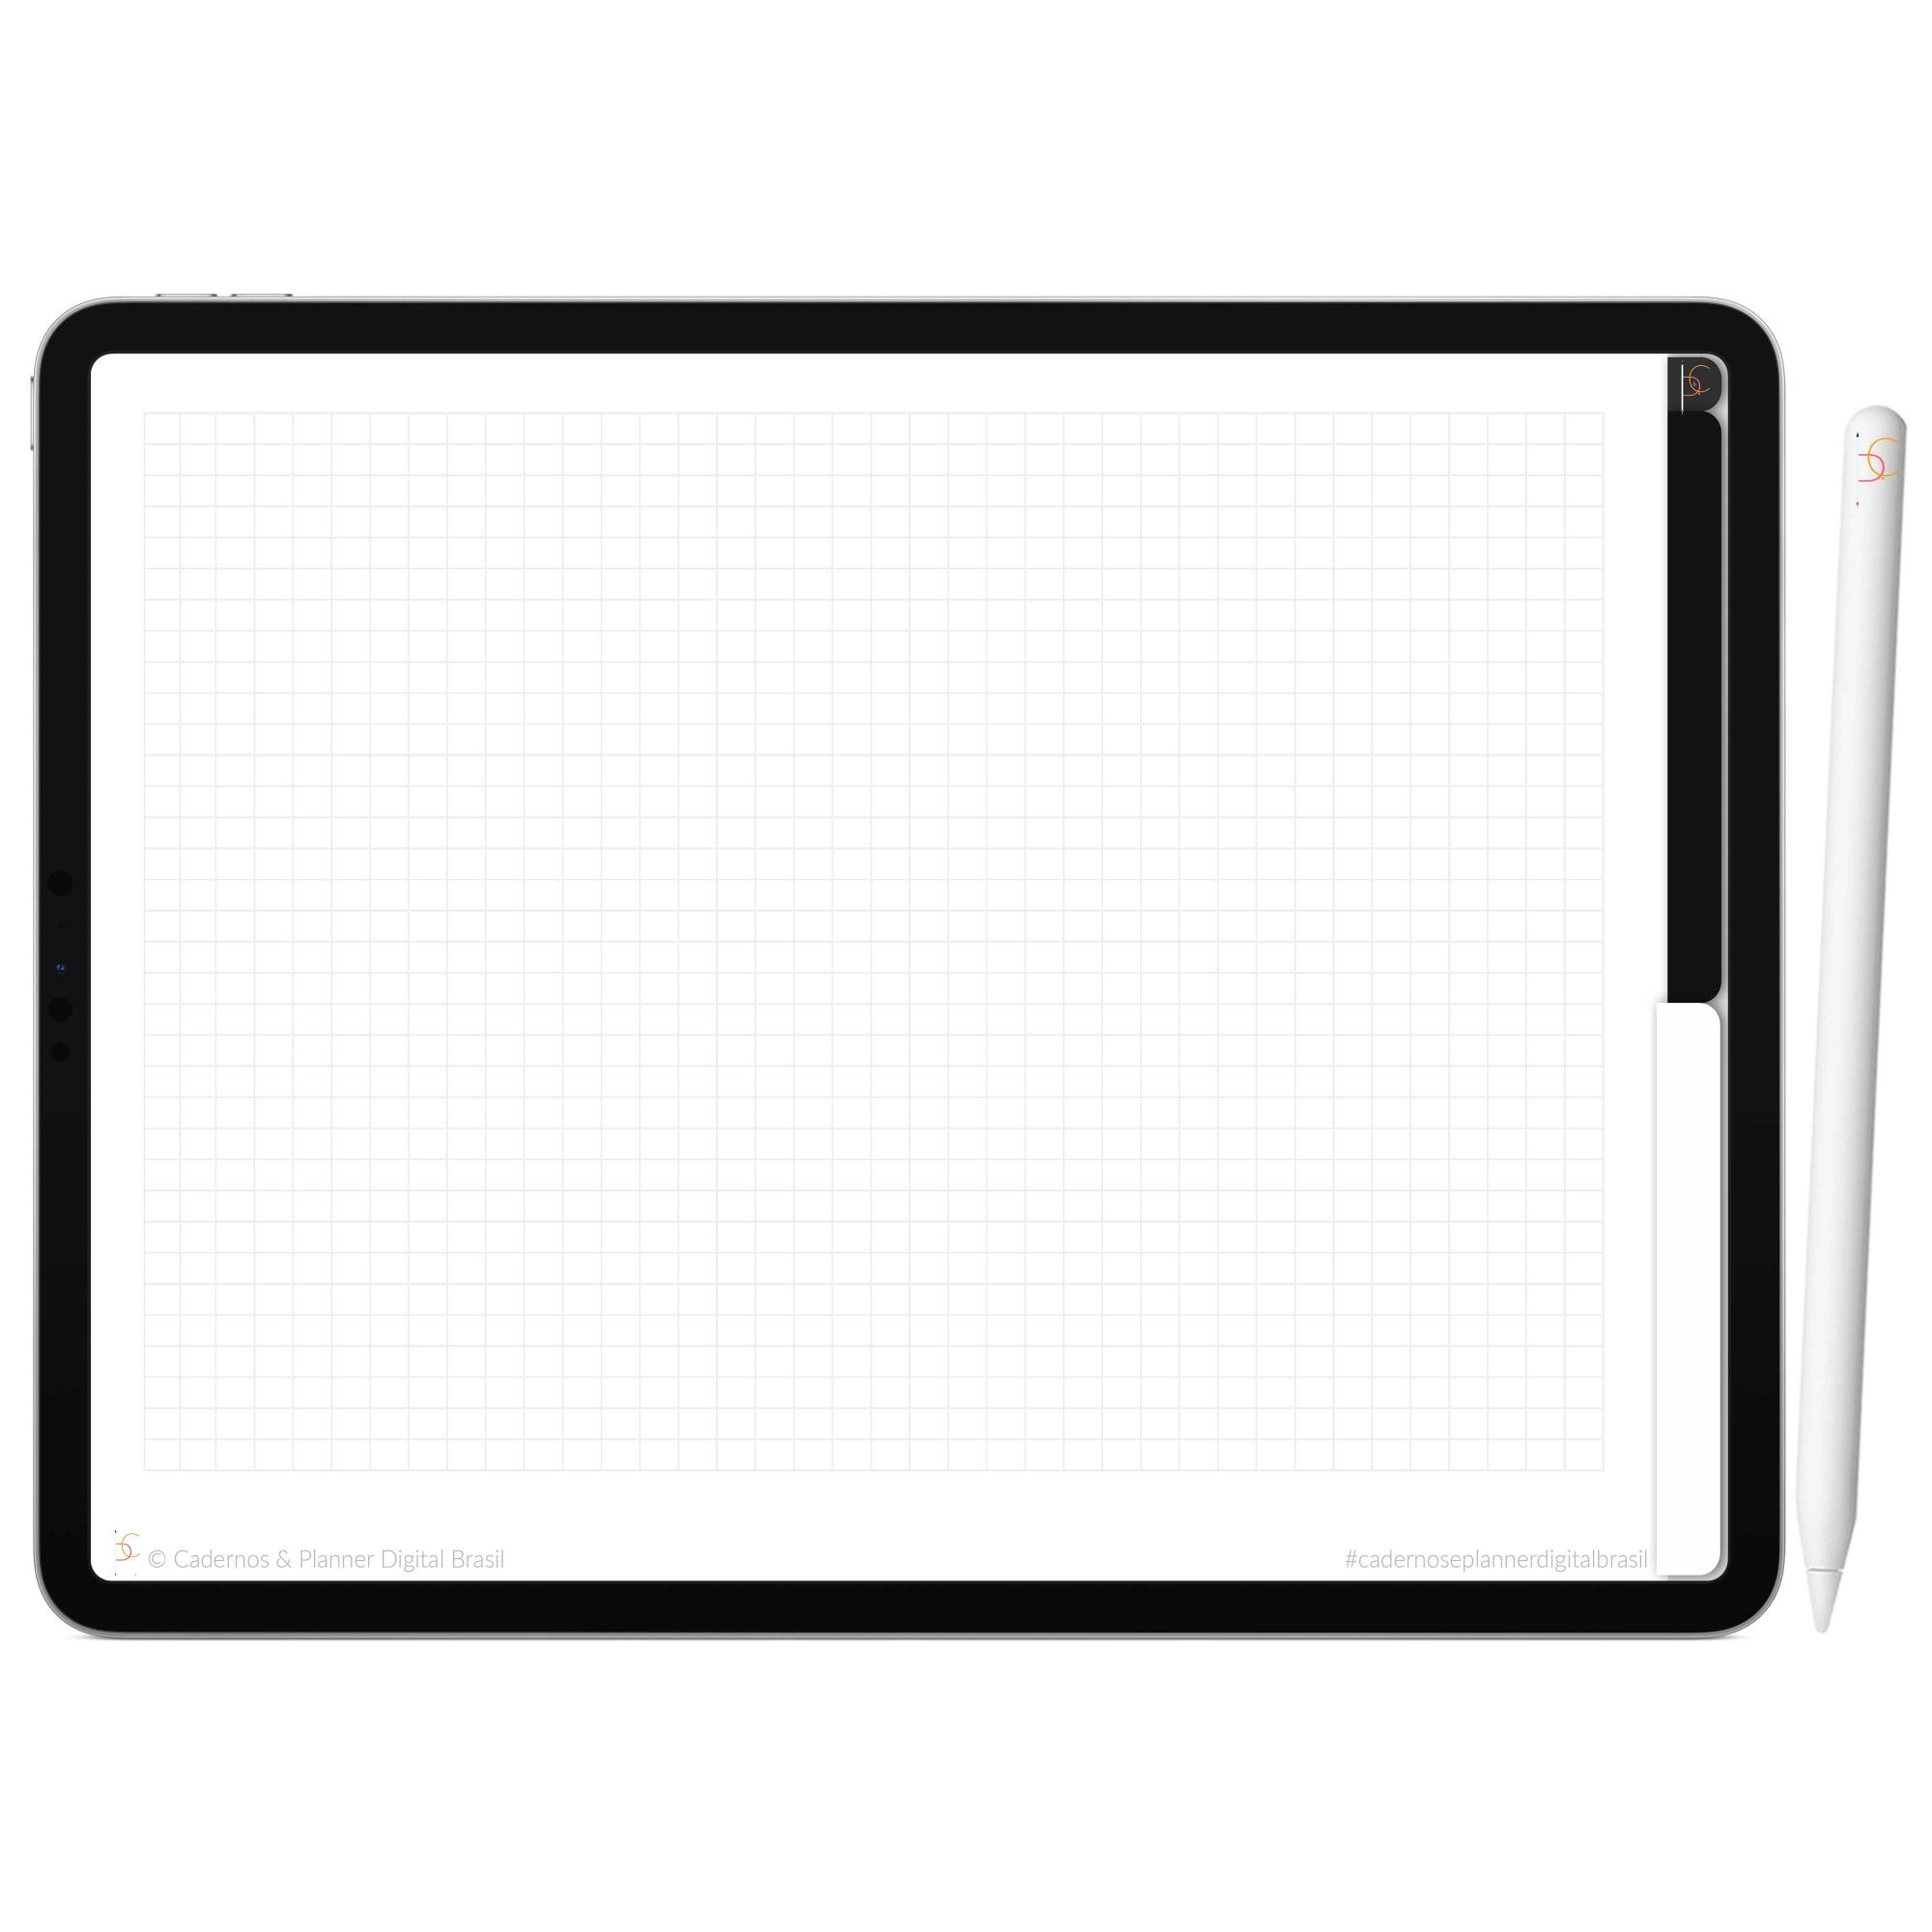 Mapa Mental Digital White Black | Duas Matérias Interativo| iPad Tablet | Download Instantâneo